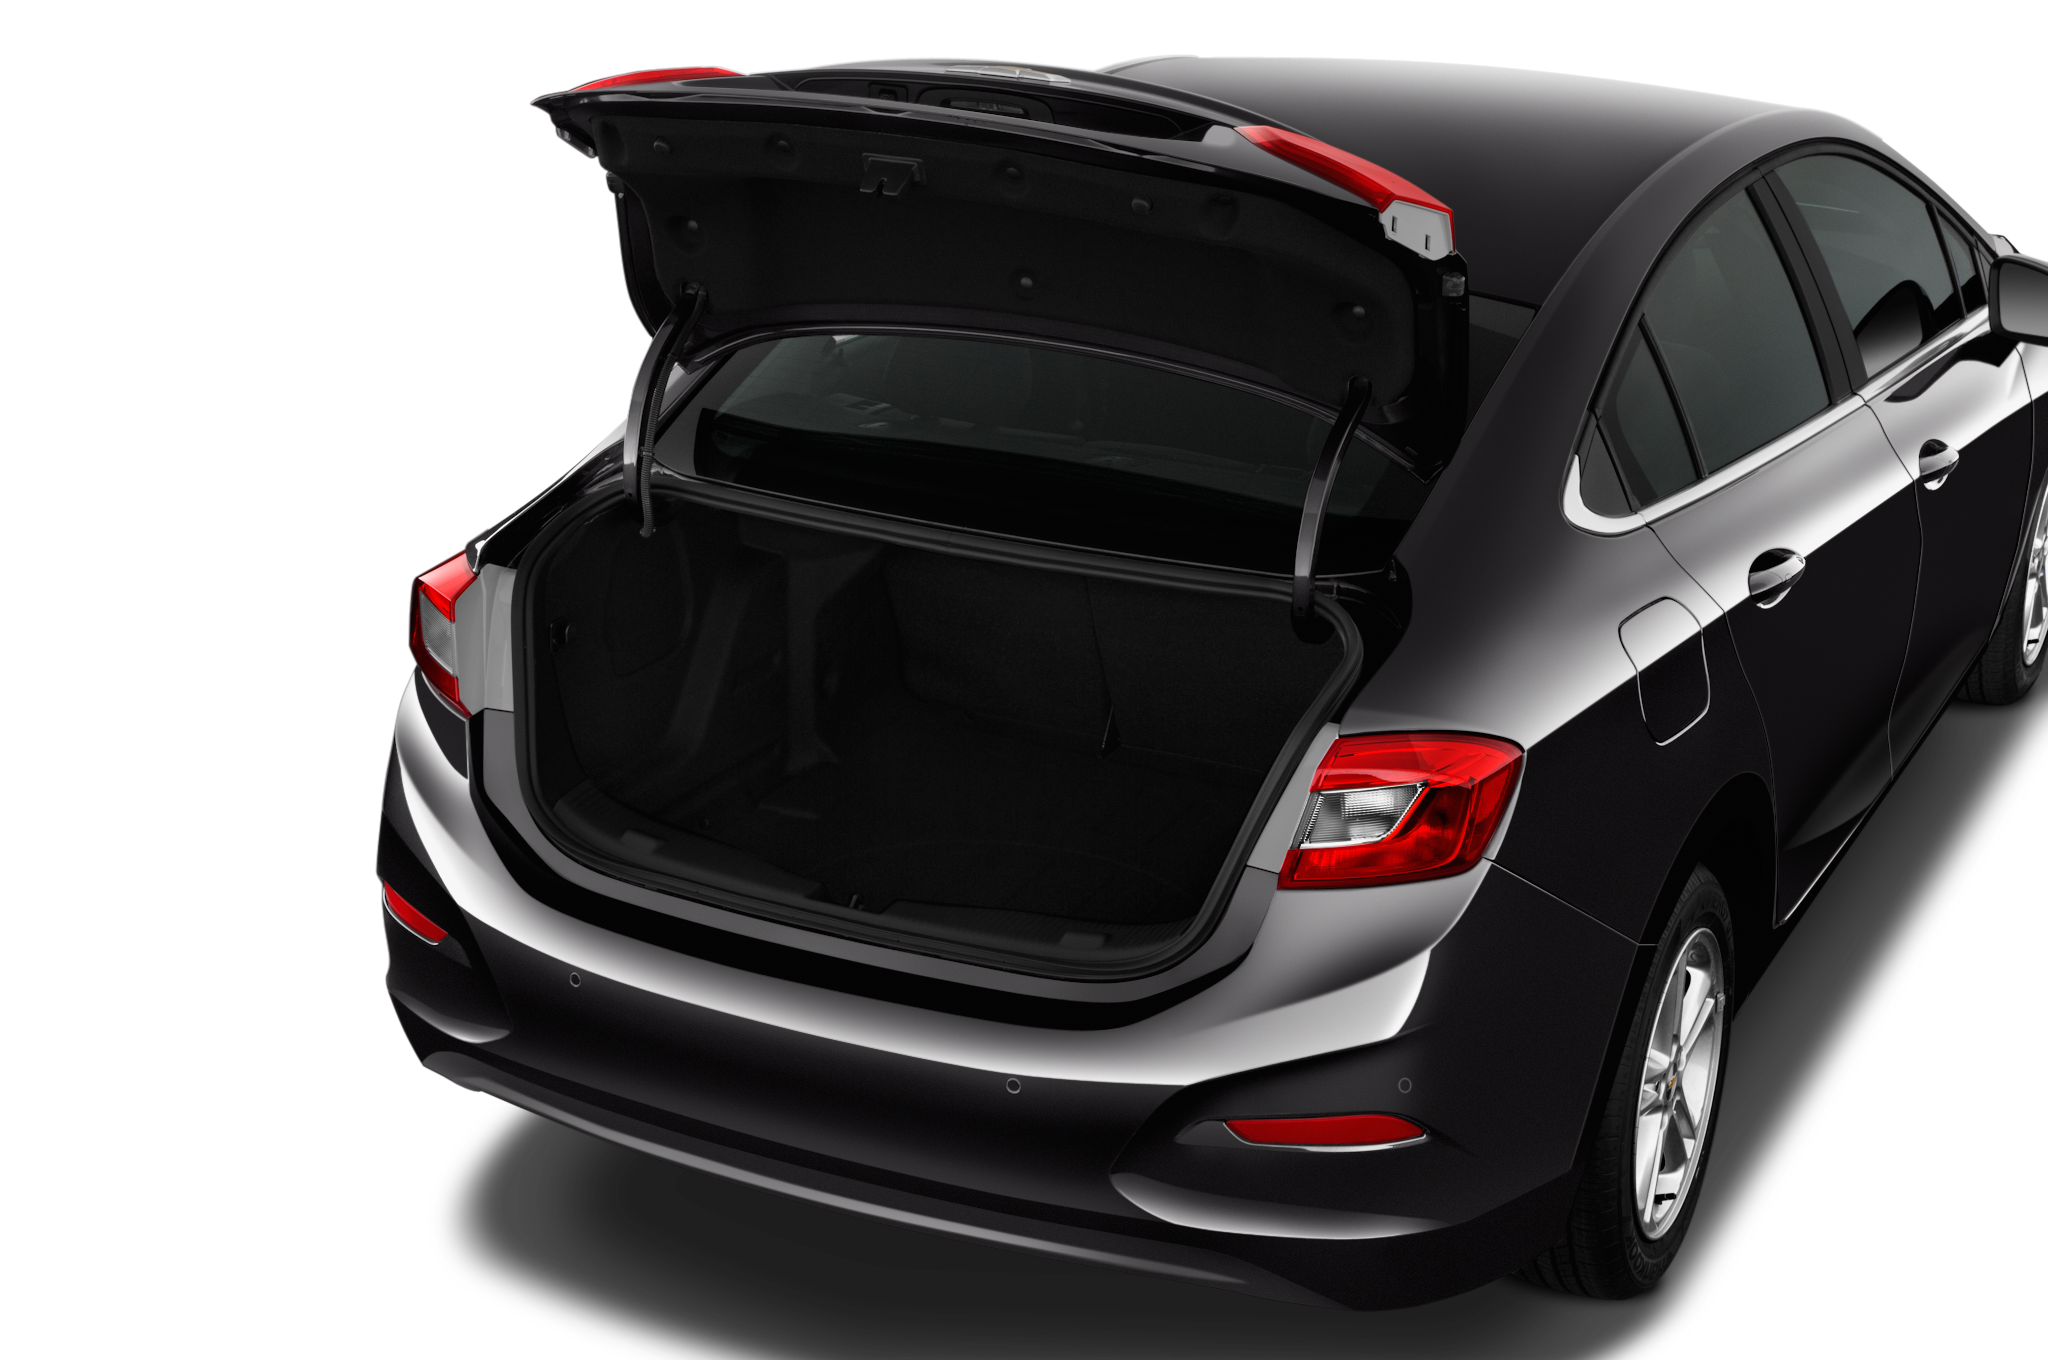 2017 chevrolet cruze hatchback first drive review automobile magazine. Black Bedroom Furniture Sets. Home Design Ideas